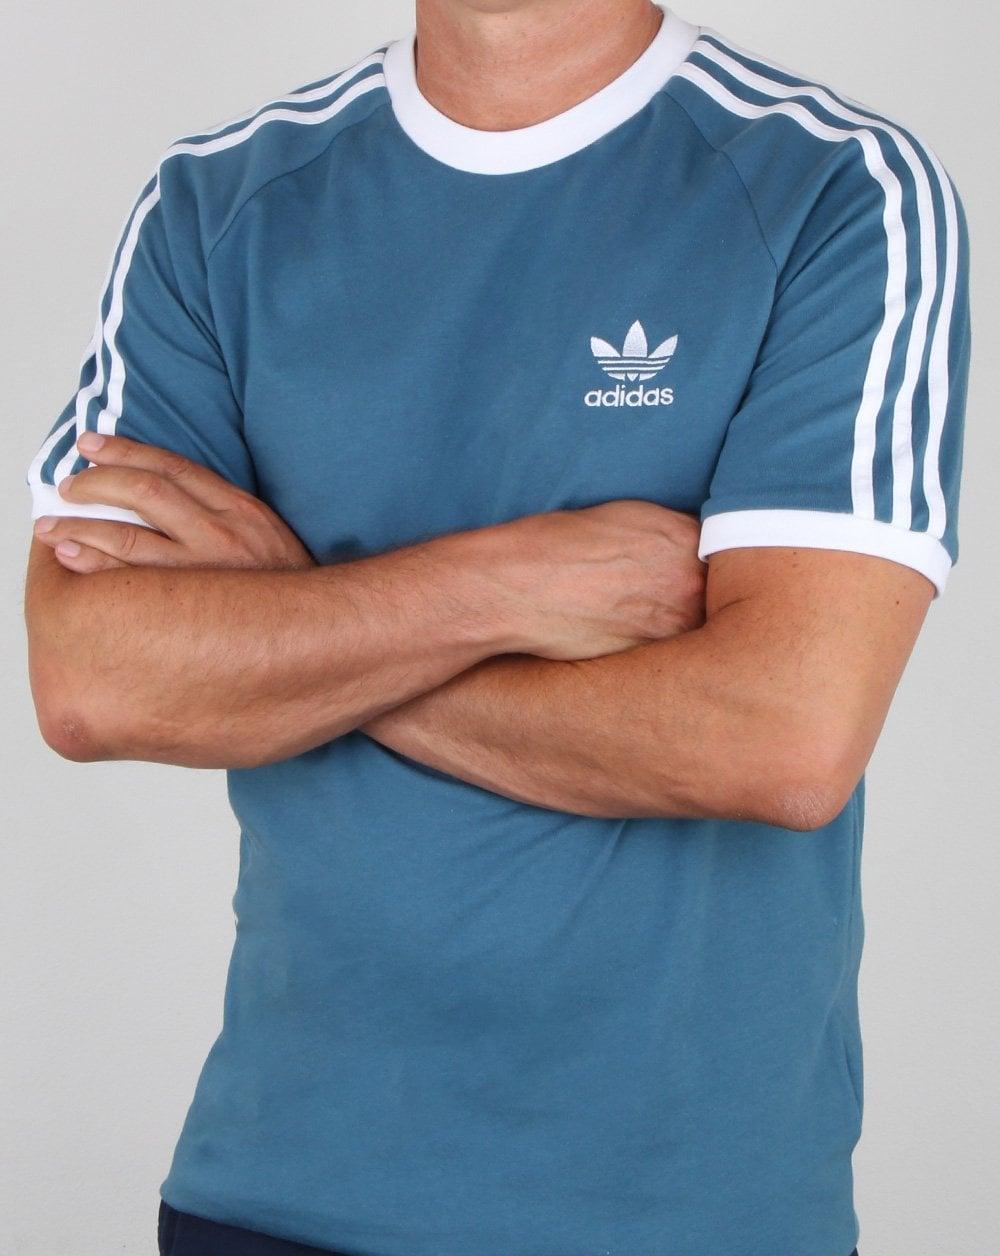 Adidas Originals 3 Stripes T Shirt Blanch Blue